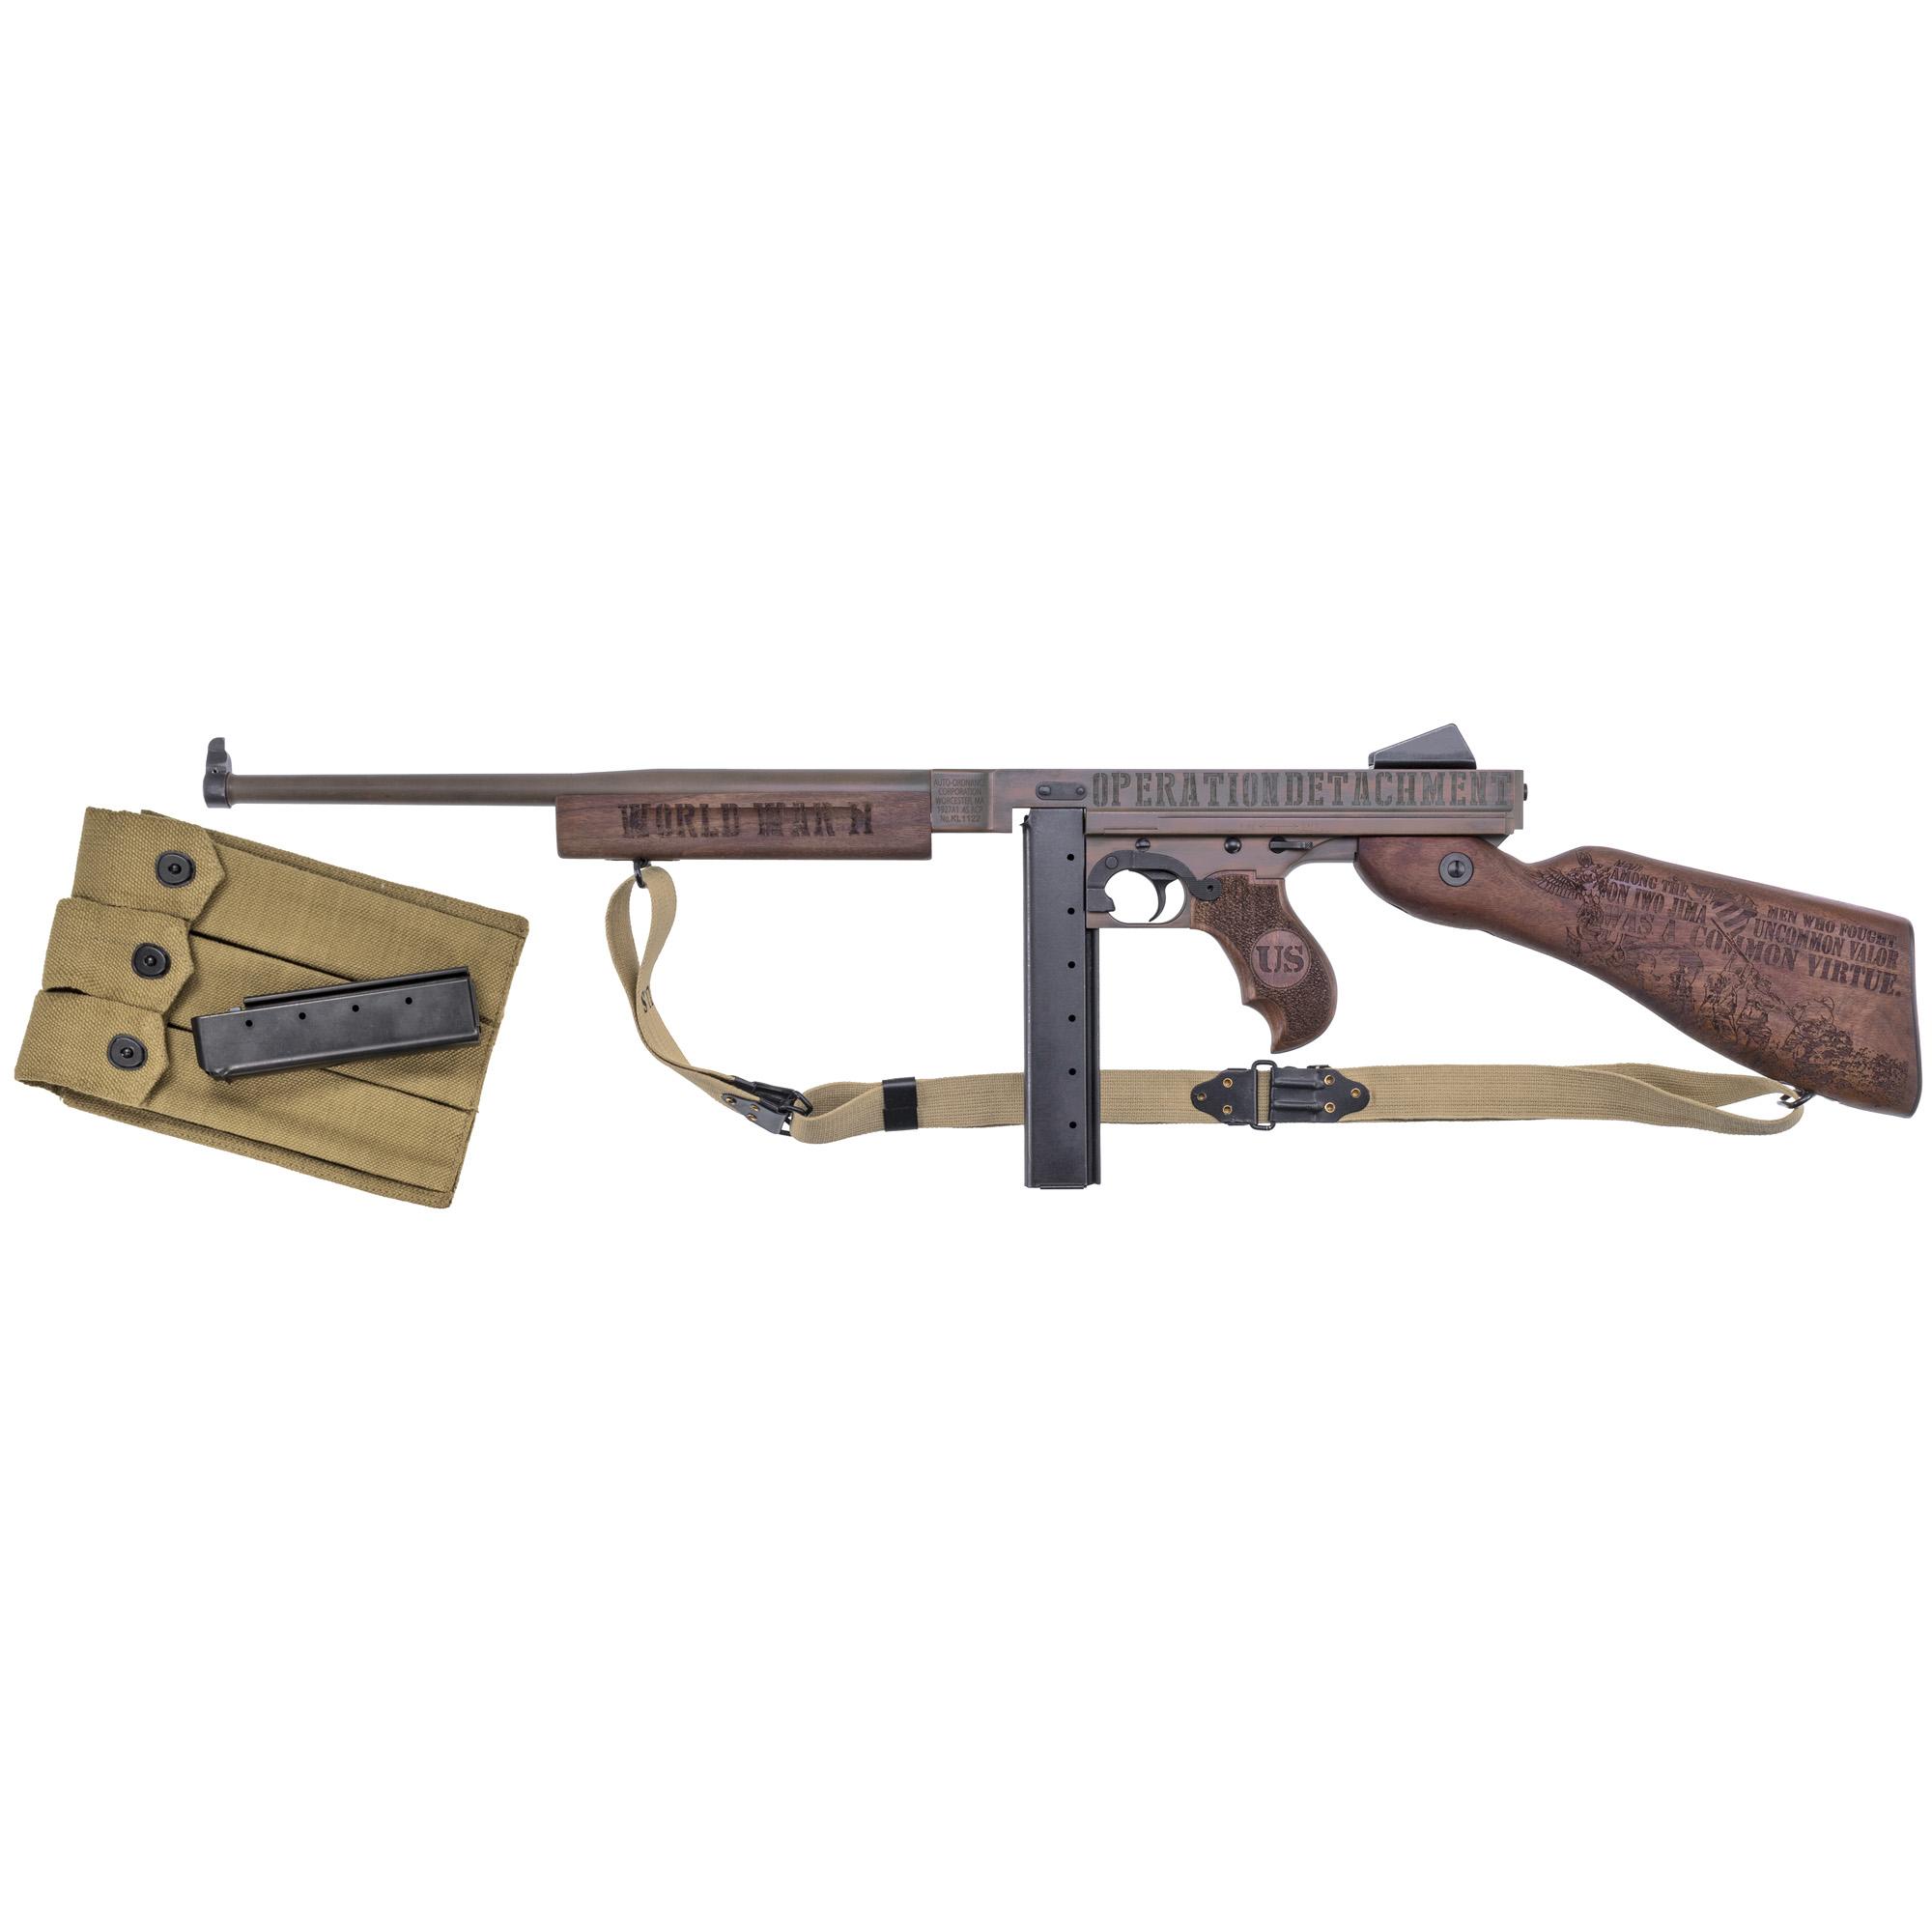 "Auto Ord Iwo Jima M1 45acp 16.5"" 20r"